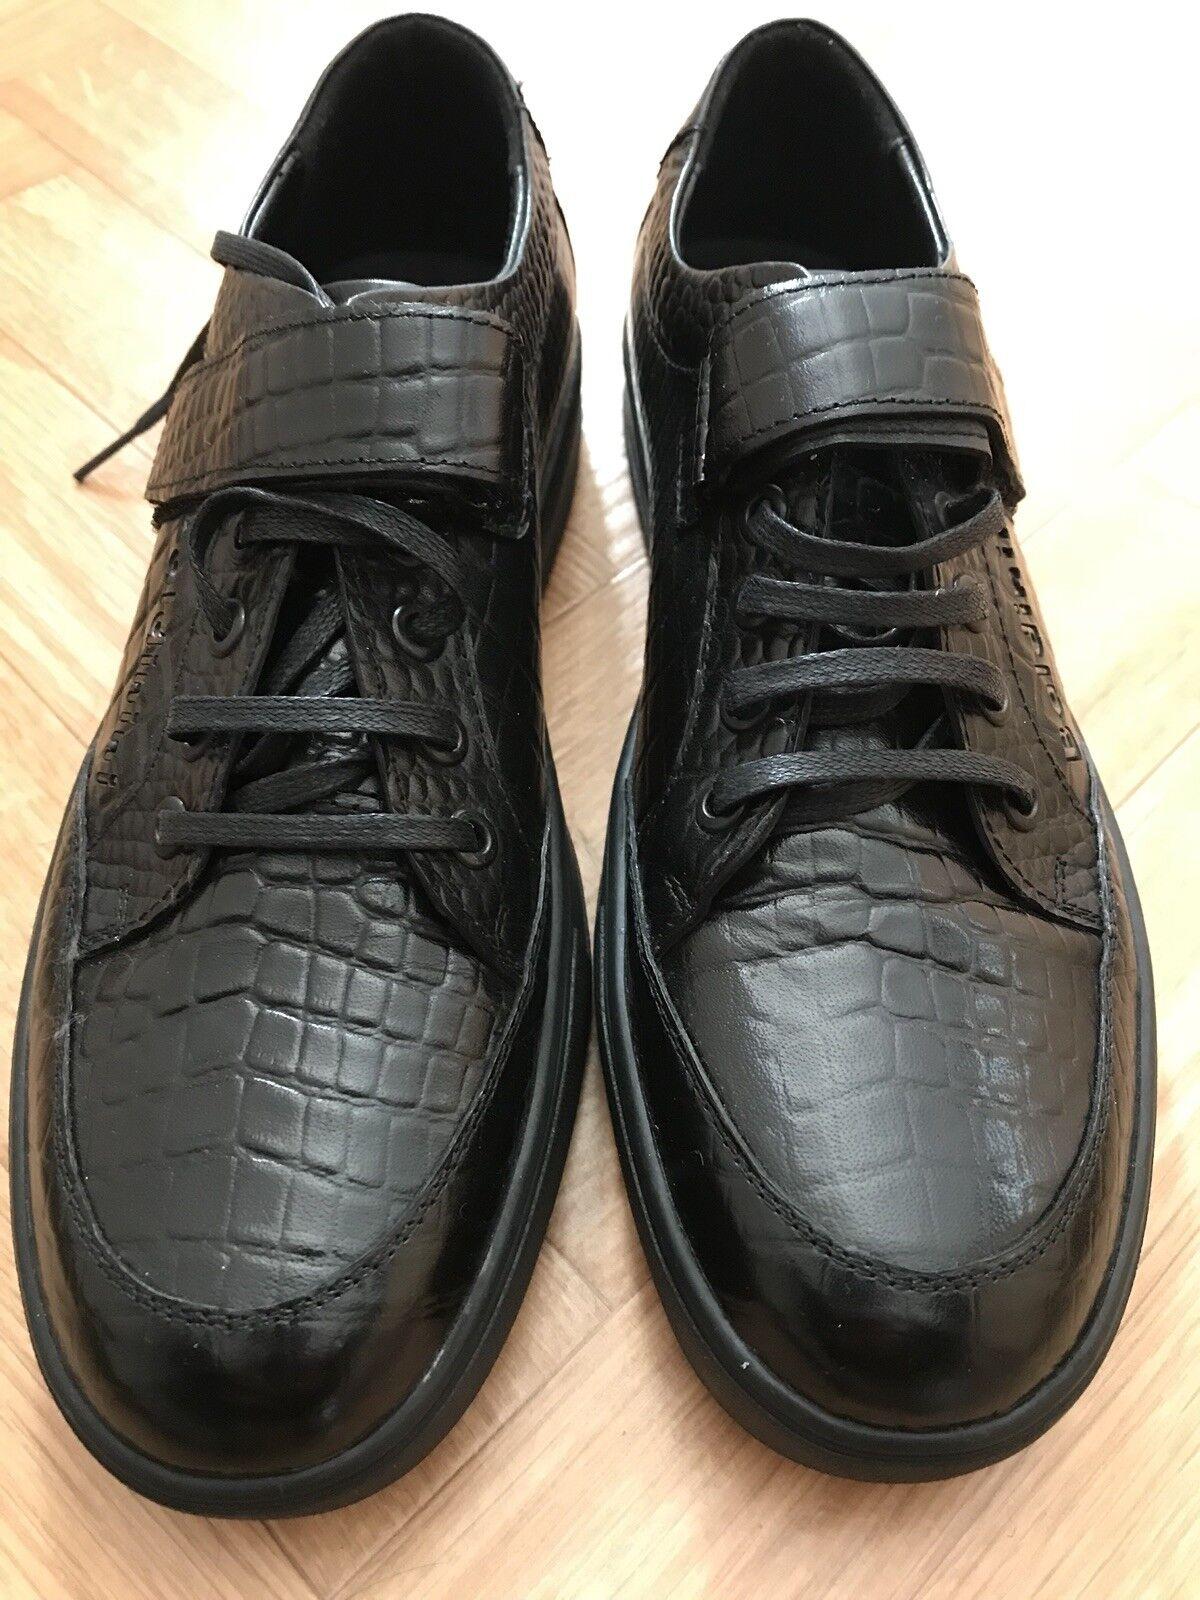 Billig hohe Qualität Baldinini Schuhe Herrenschuhe Gr.41